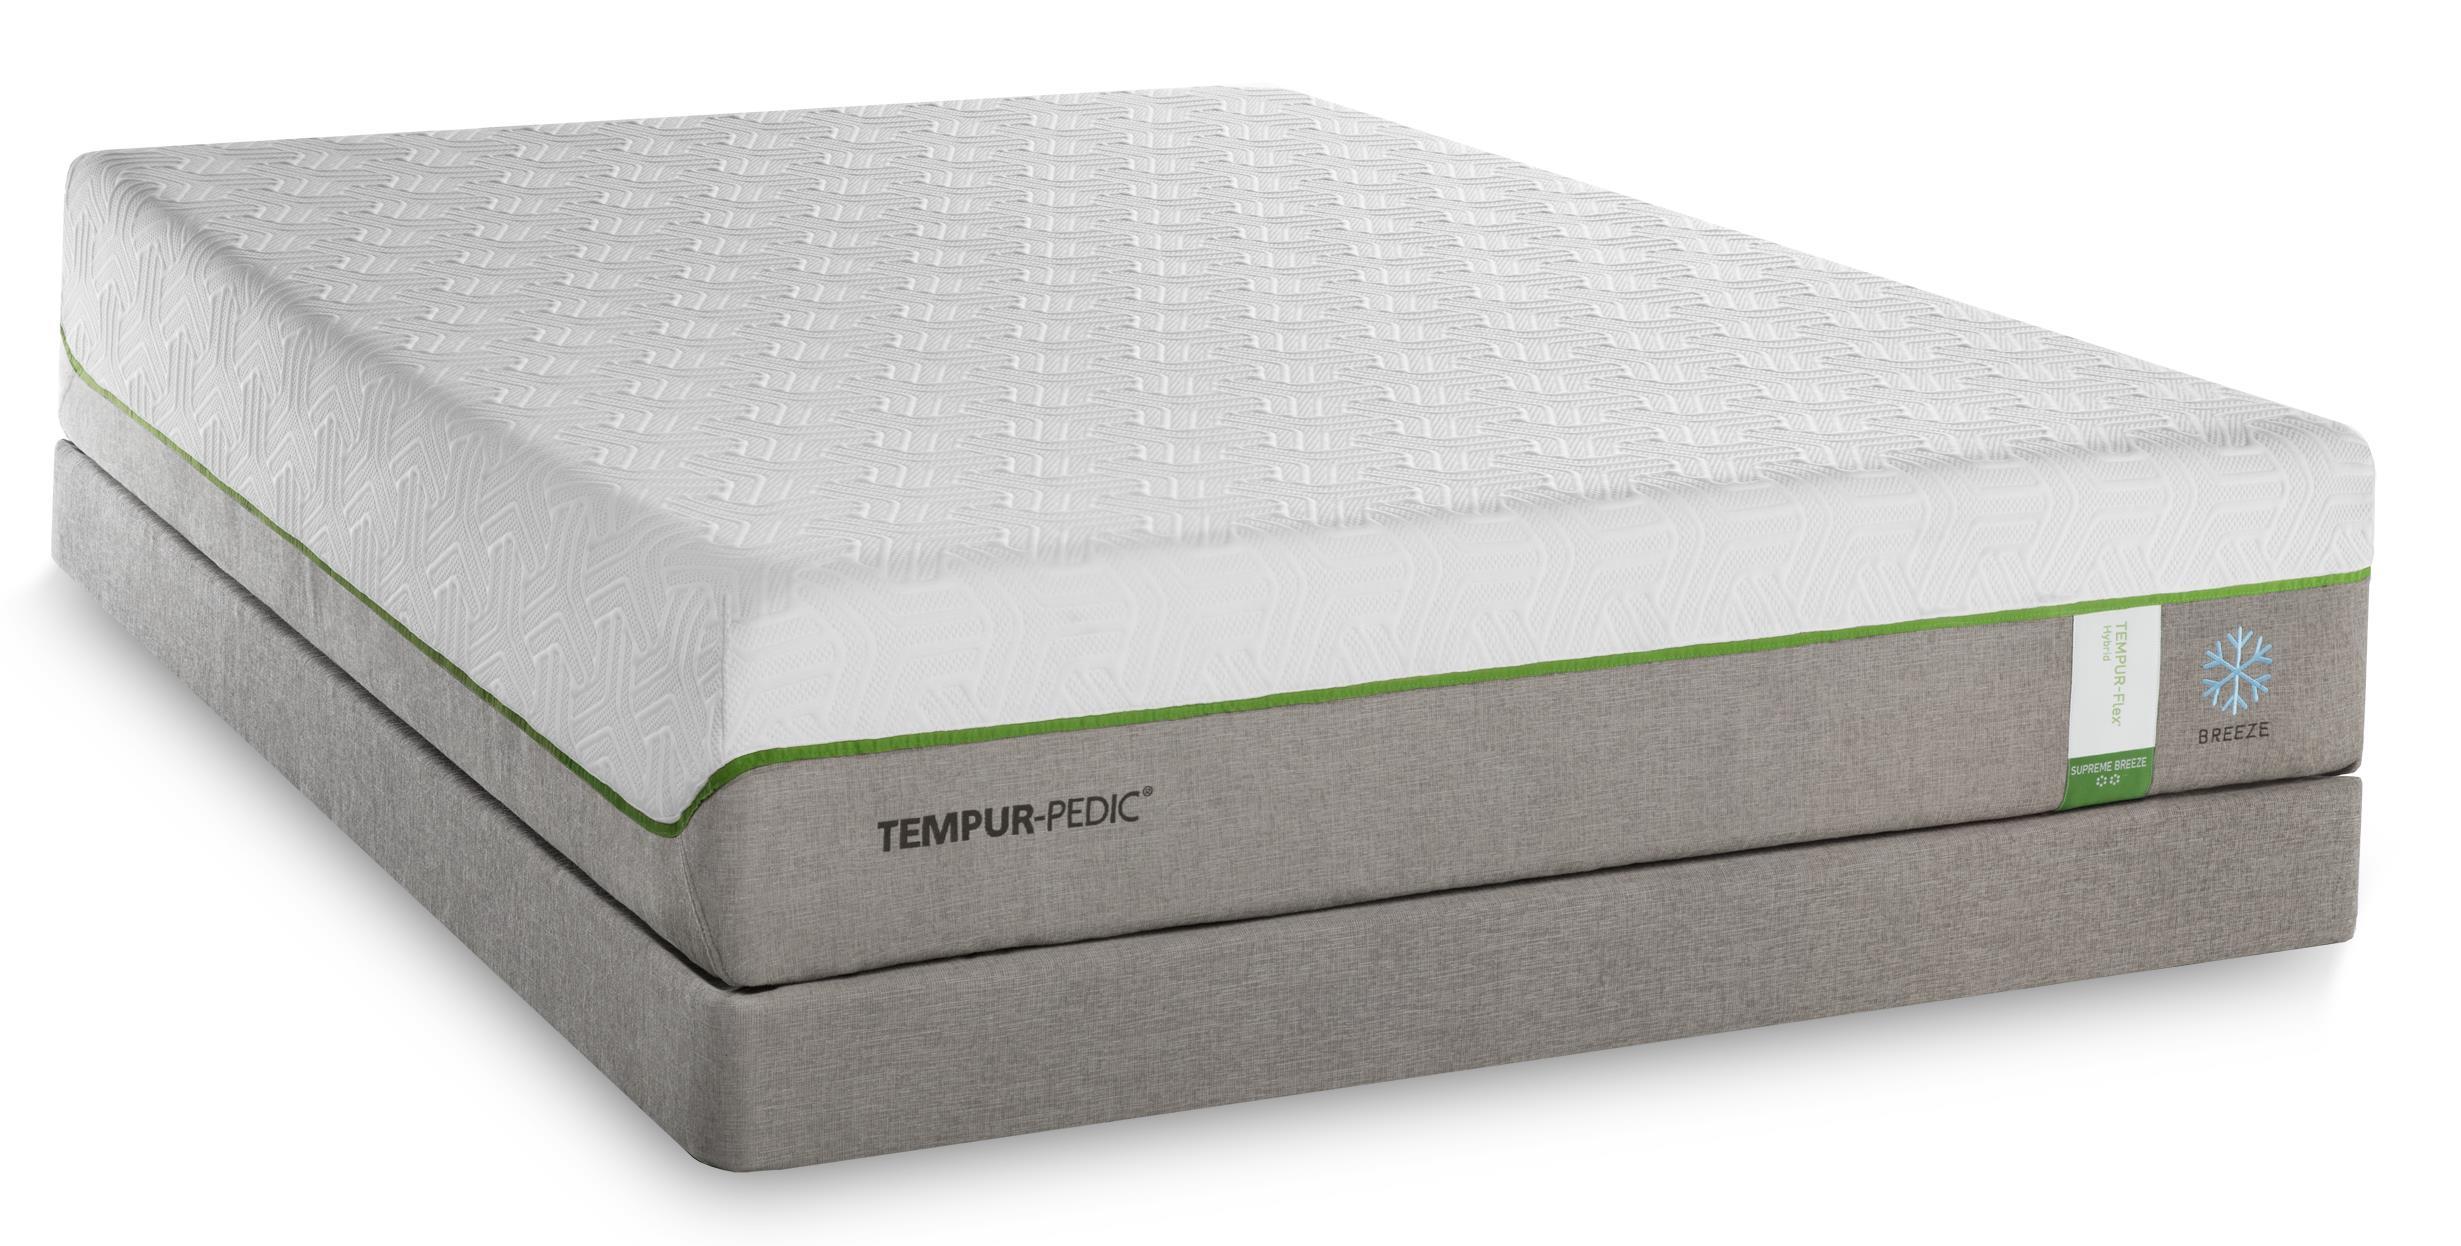 Tempur-Pedic® TEMPUR-Flex Supreme Breeze California King Medium Plush Matt Set, LP - Item Number: 10292280+2x21510190